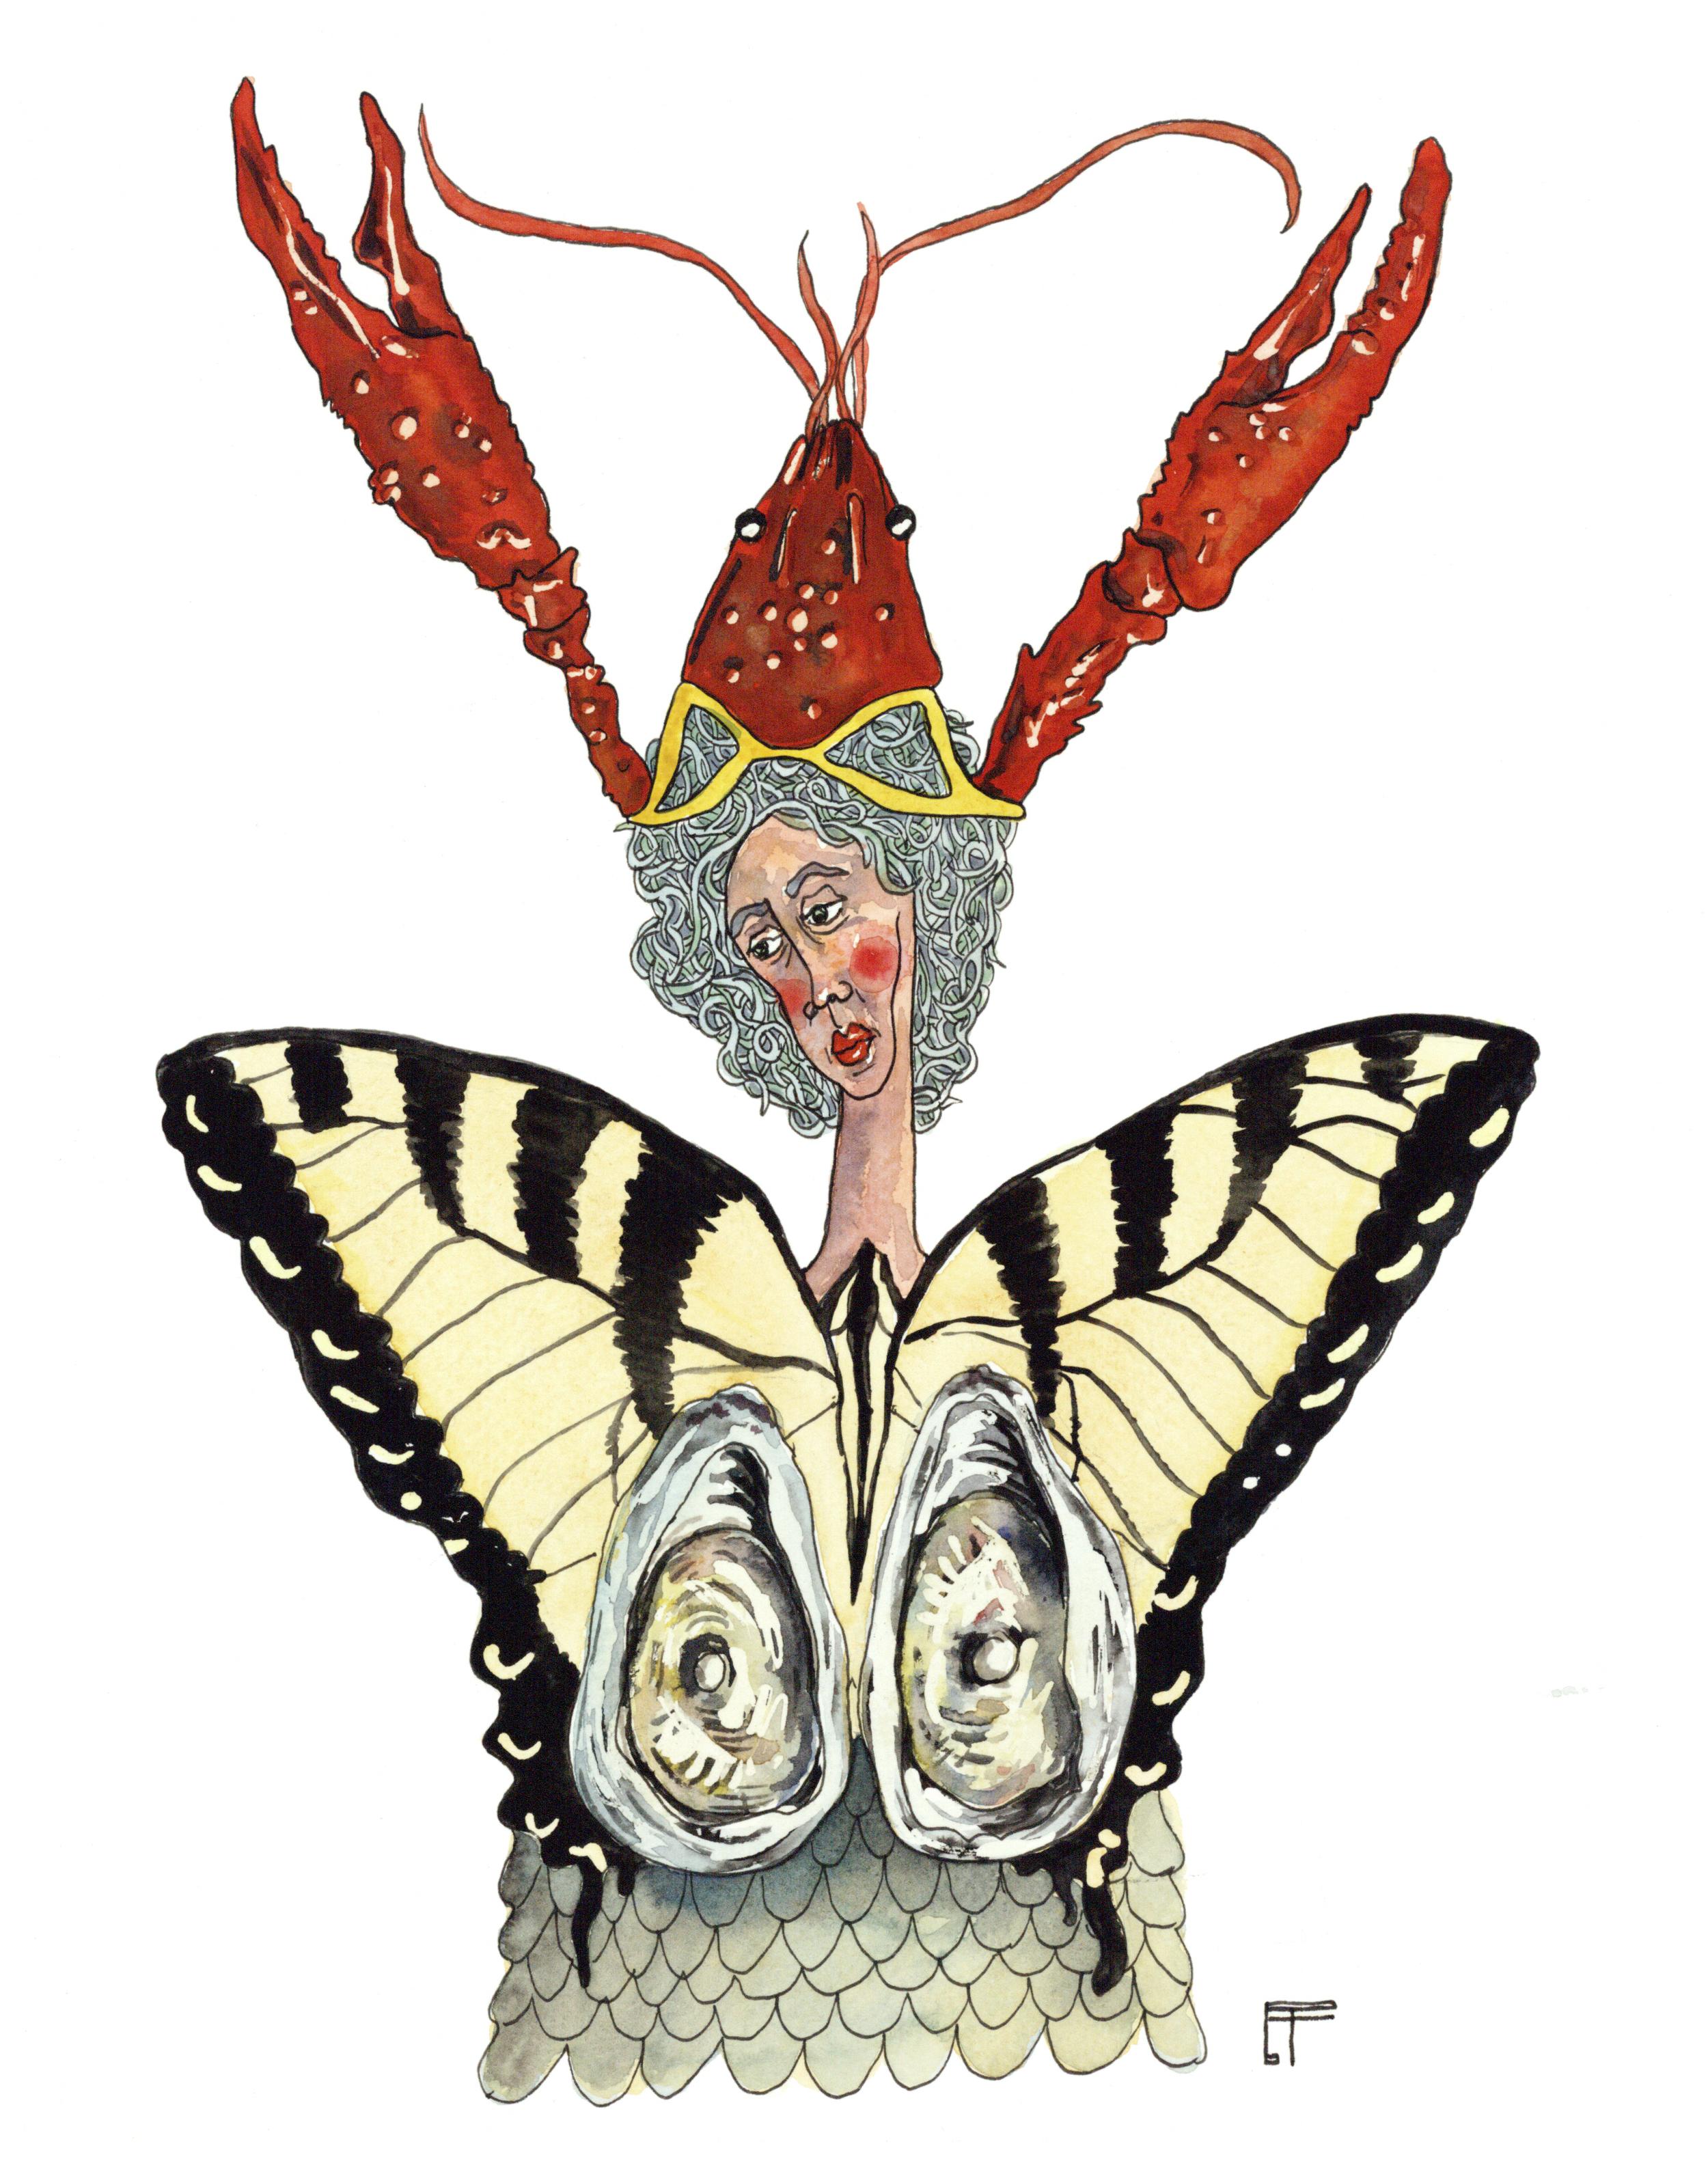 Louisiana Deity: Swallowtail